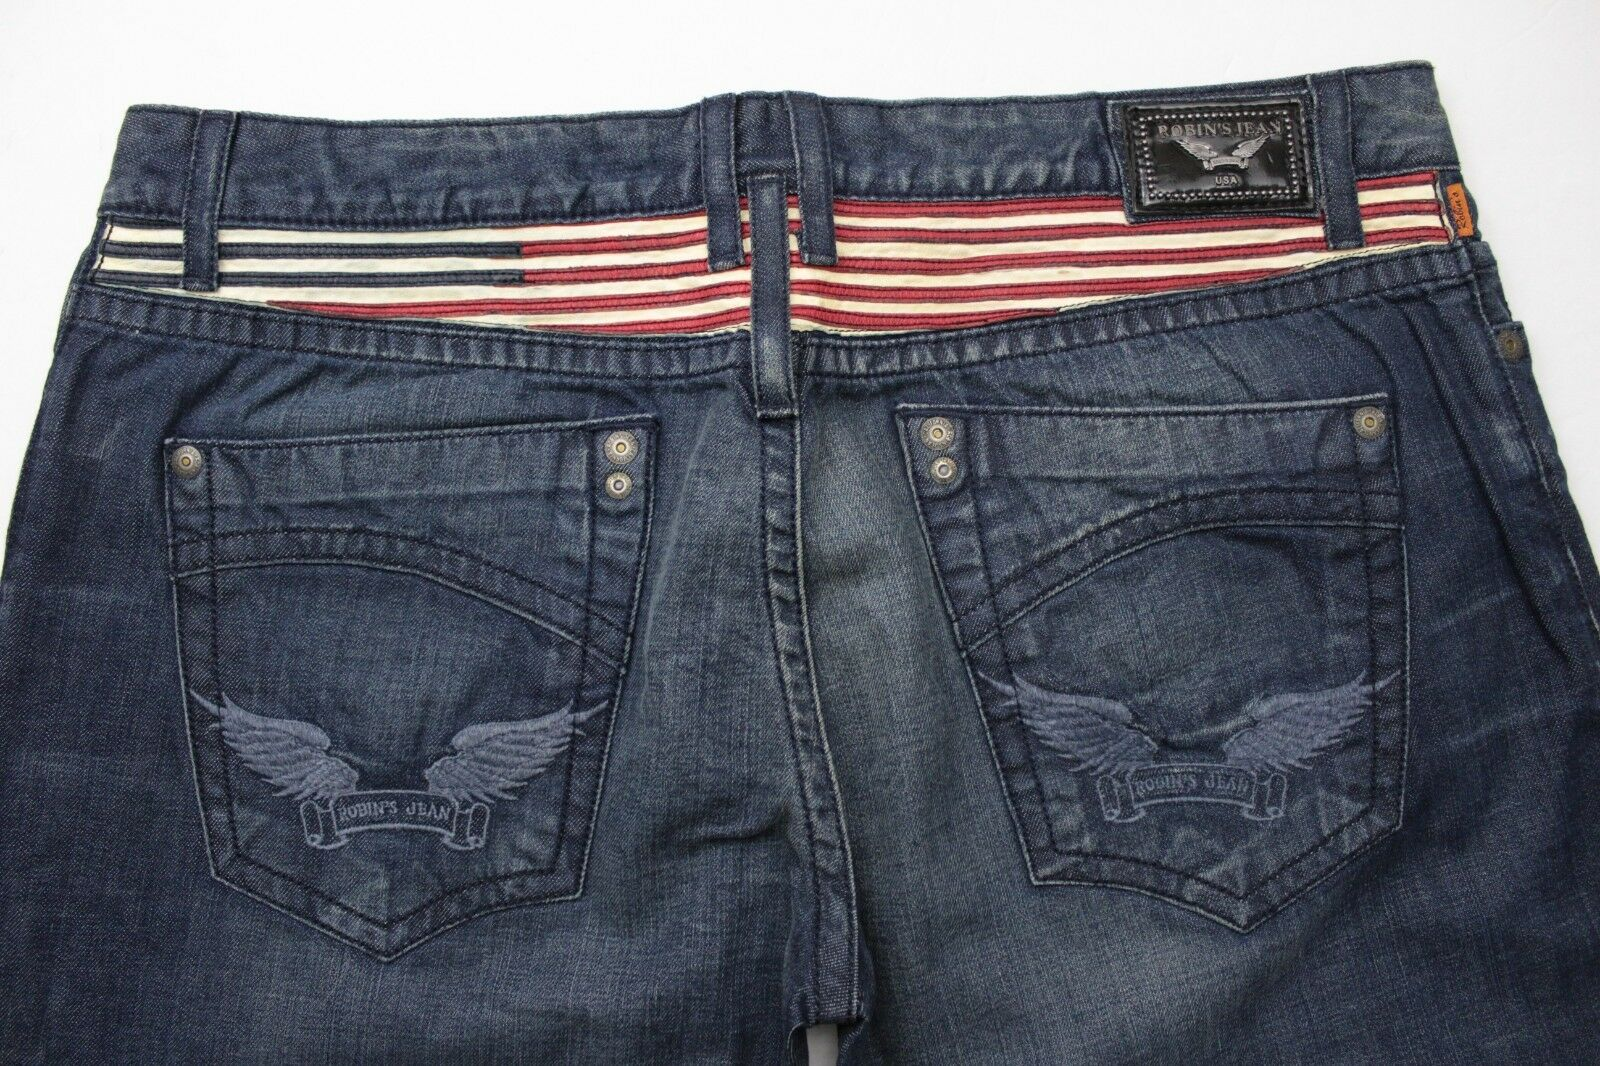 Robin's Jean U.S. Stripes - Size 40